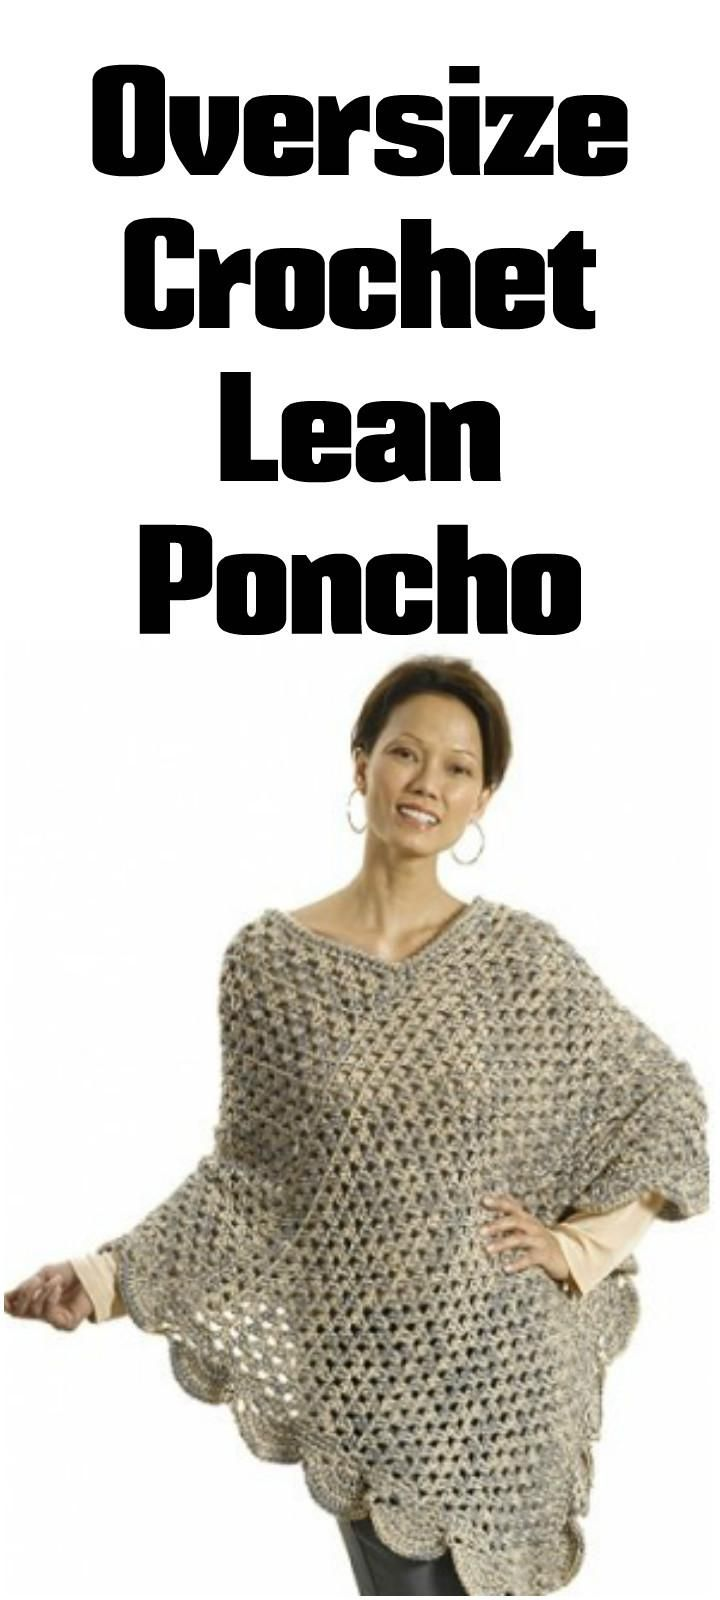 50 Free Crochet Poncho Patterns for All | Accesorios Vestuario ...